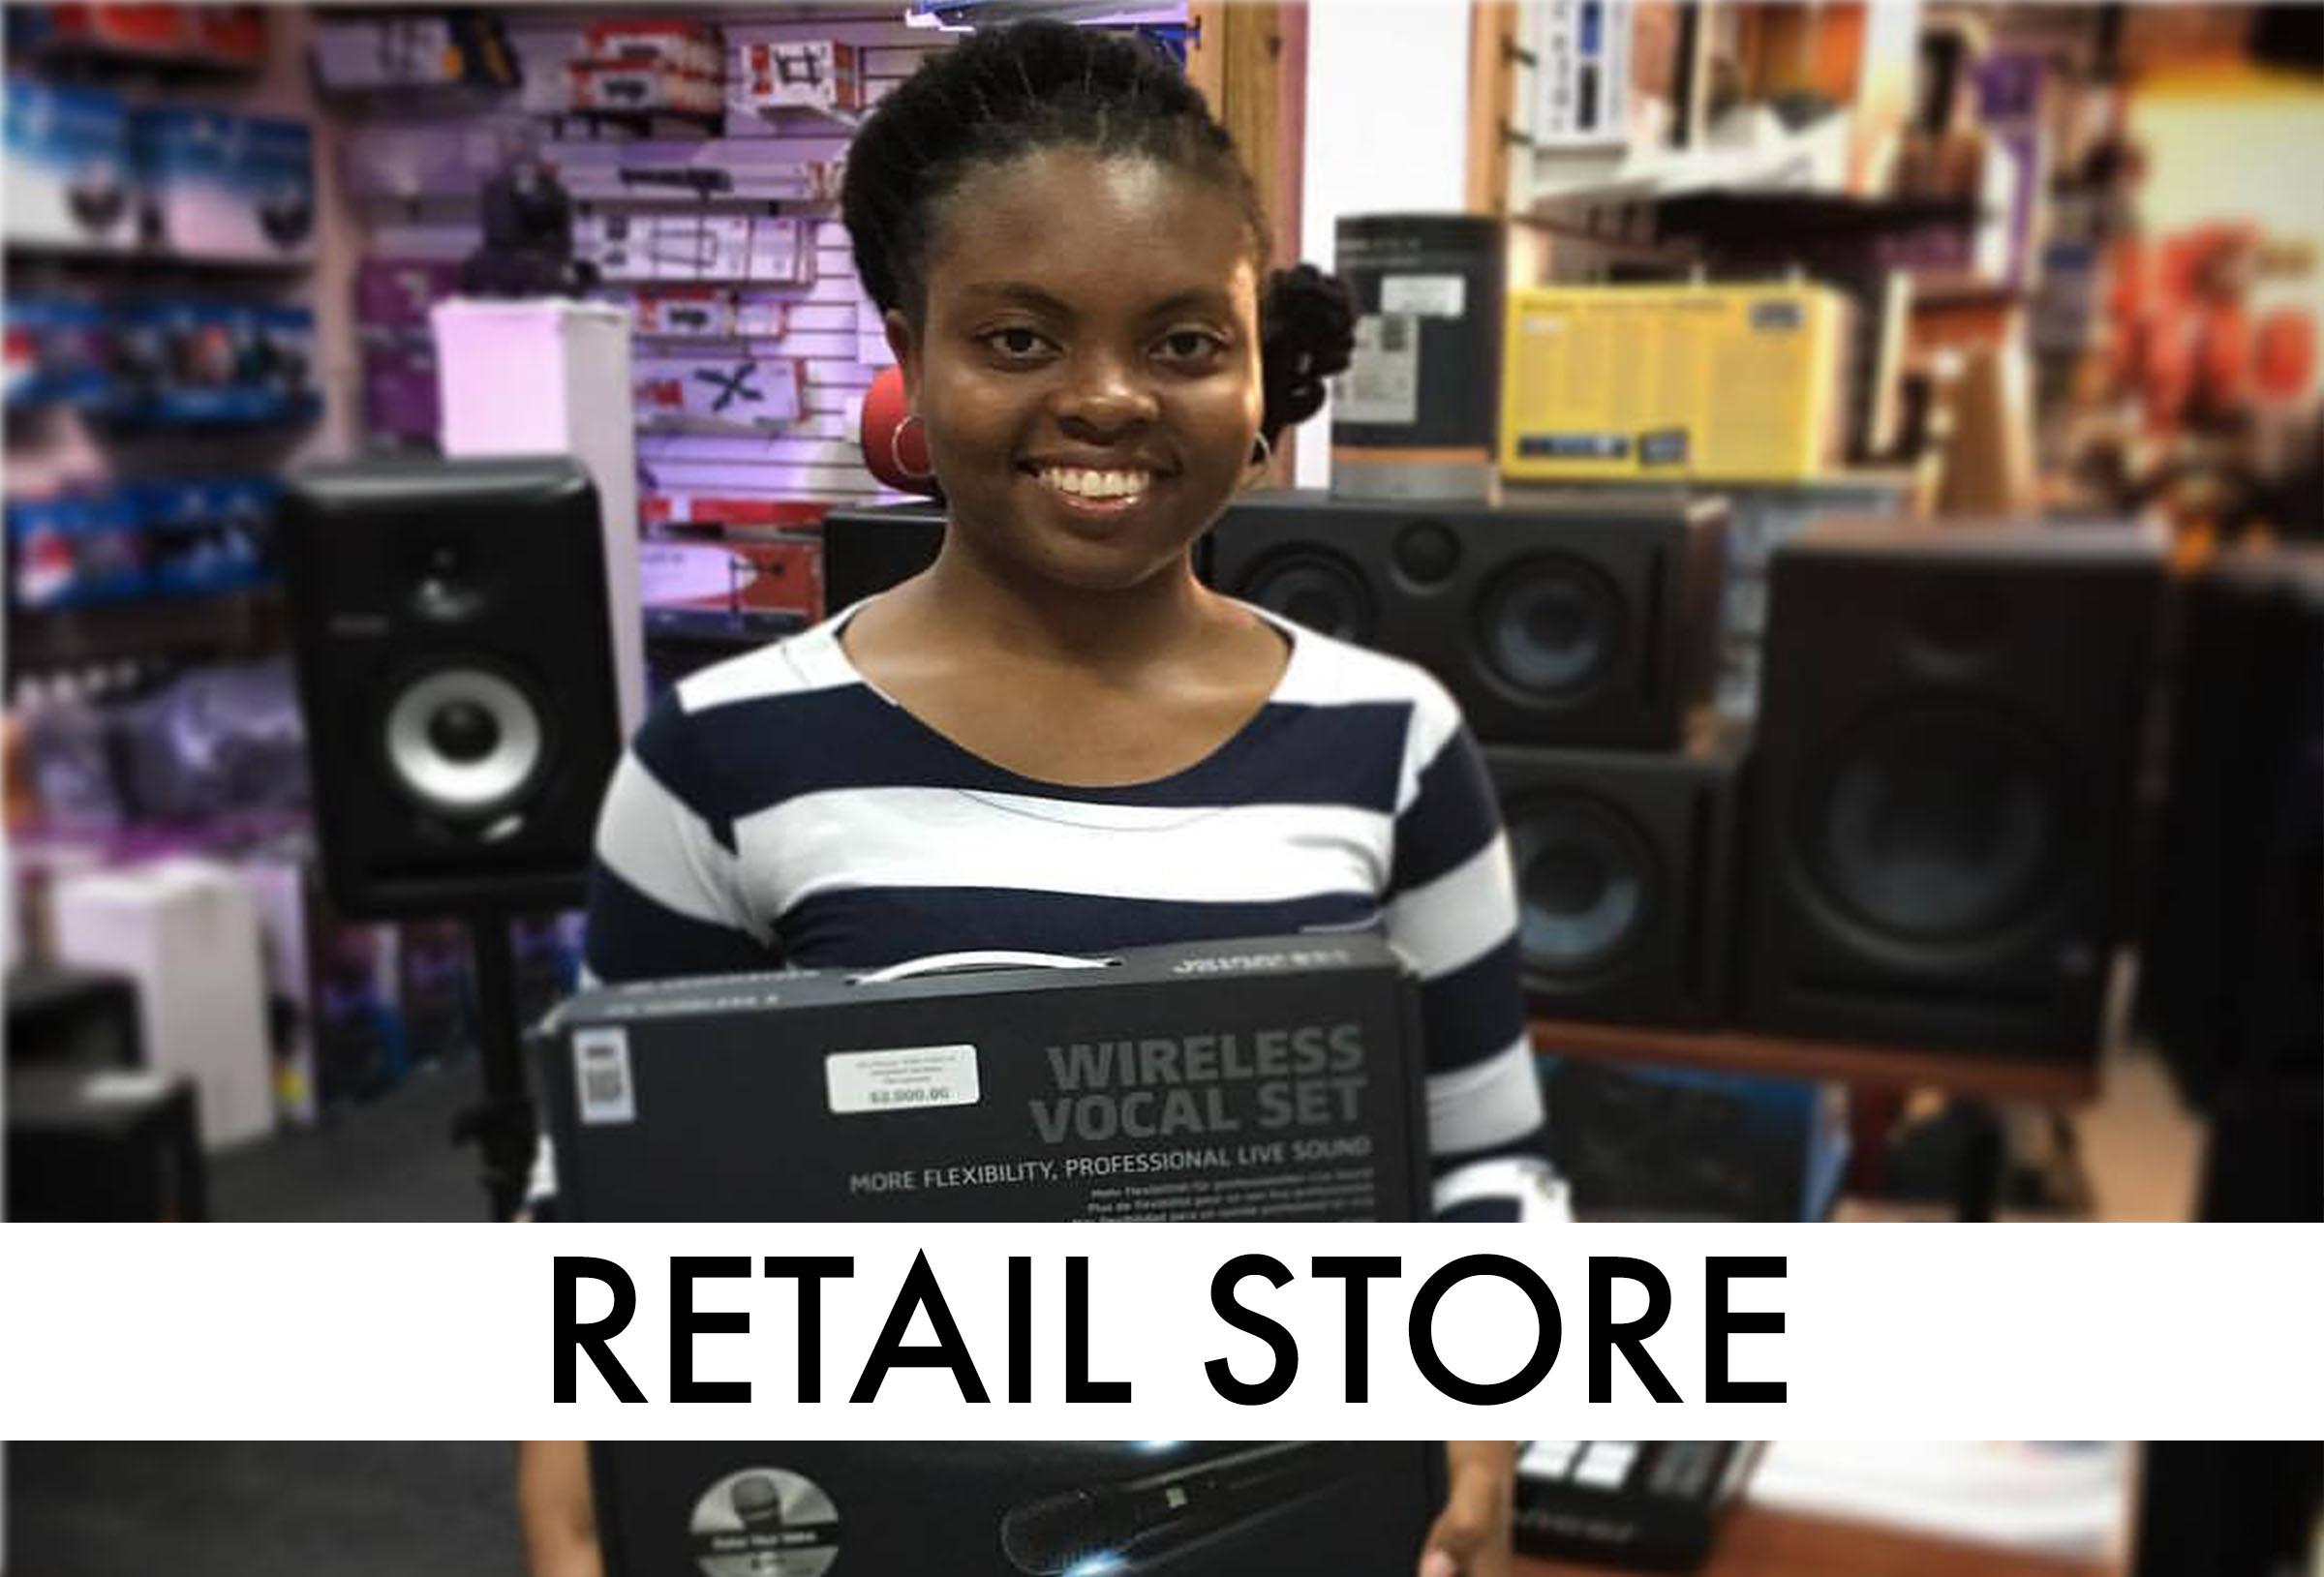 CET Retail Caribbean islands sales jbl audiotechnica soundcraft presonus krk pioneer akg bss amx lexicon prv